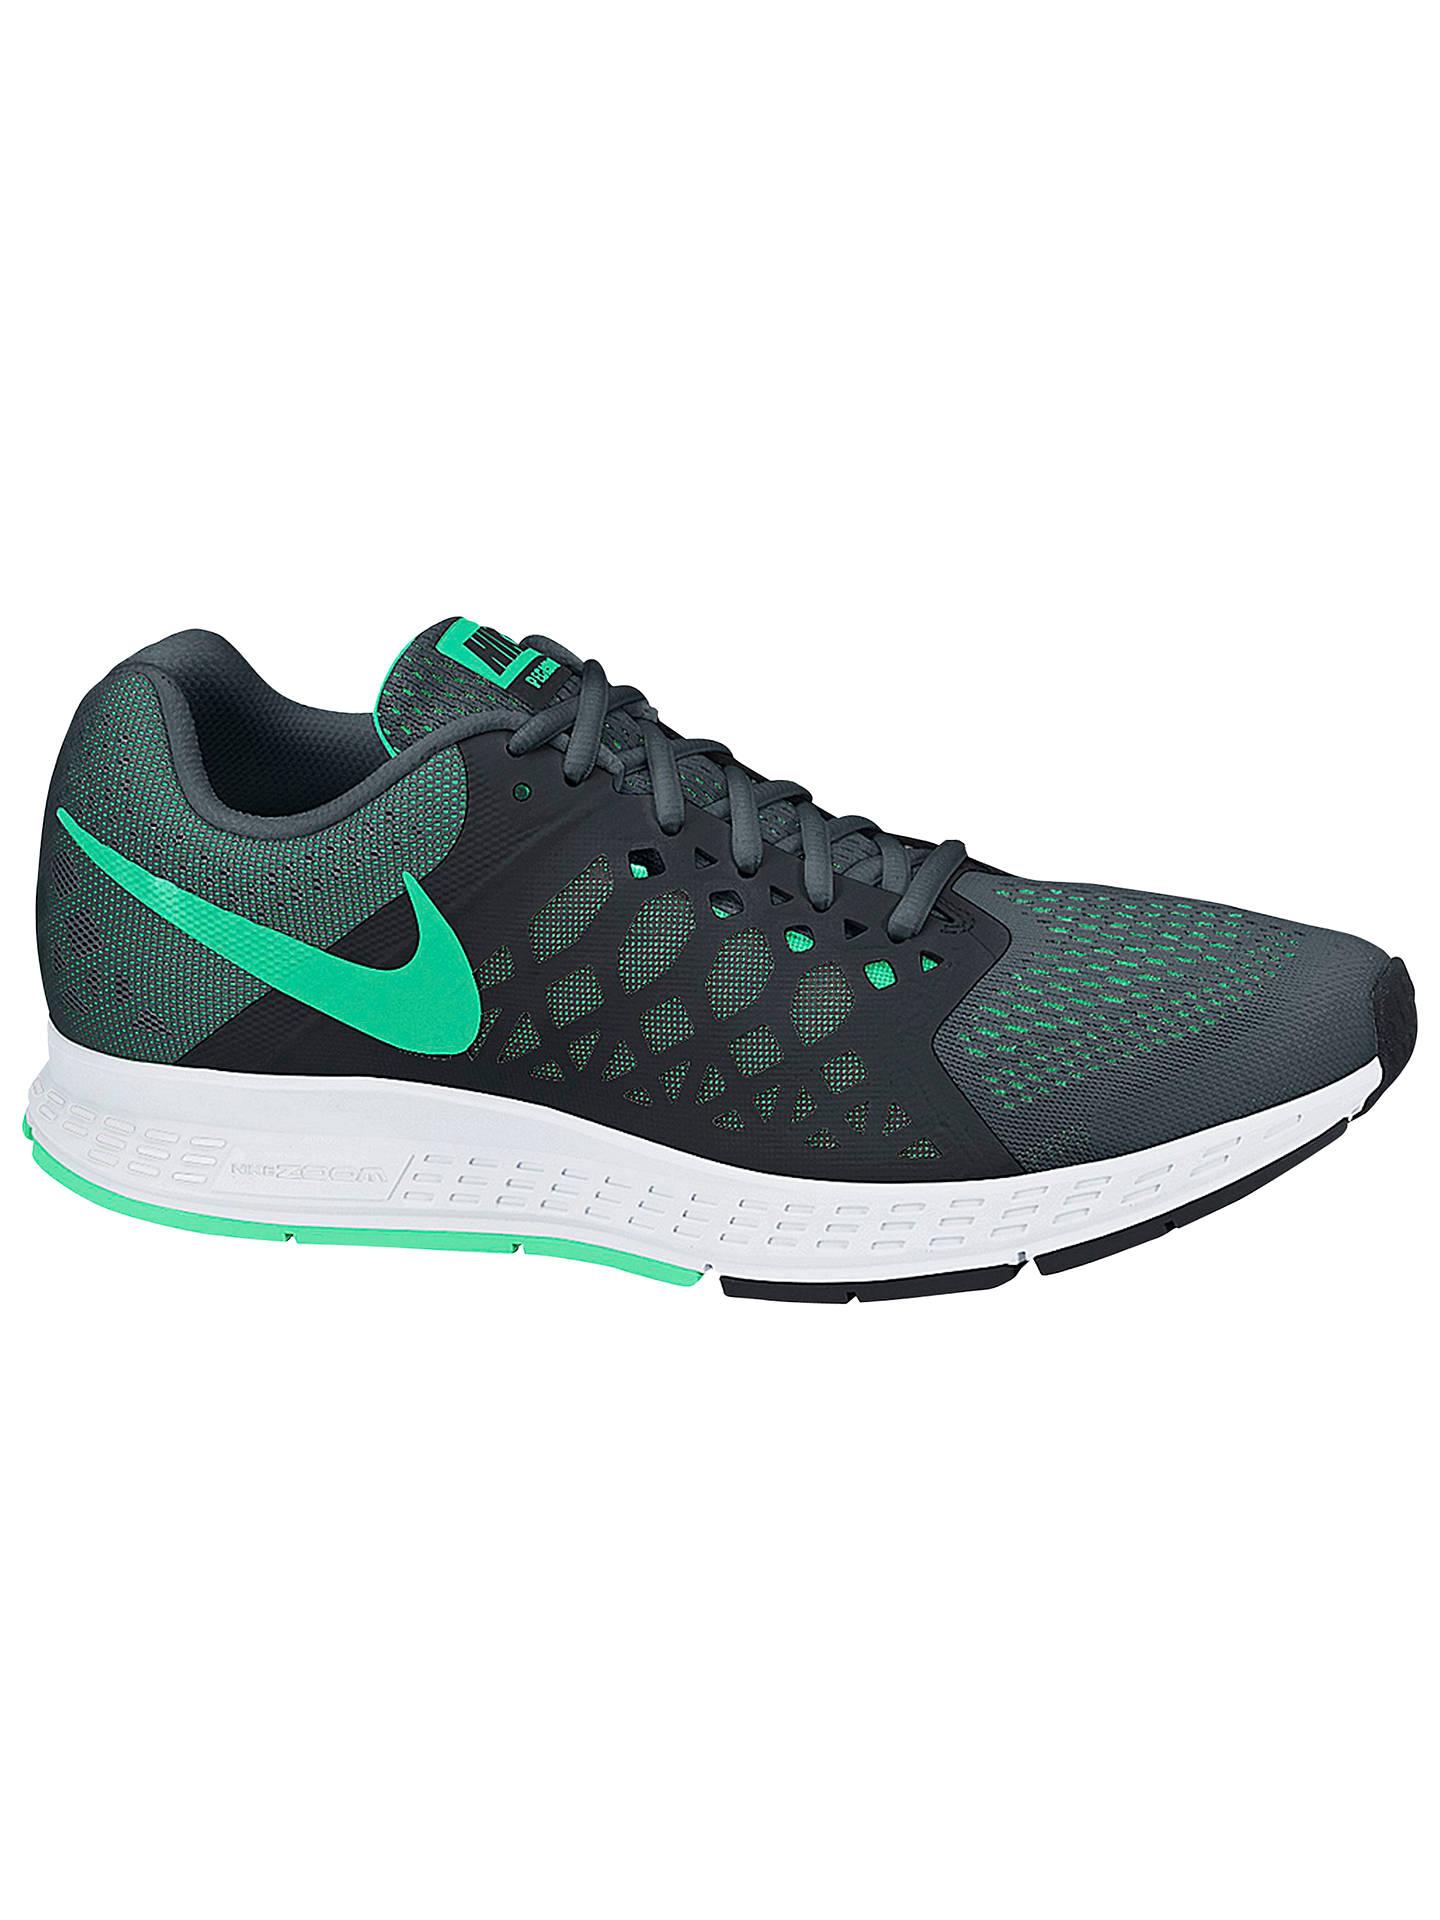 plus récent a3ba9 a41dd Nike Air Zoom Pegasus 31 Women's Running Shoes at John Lewis ...